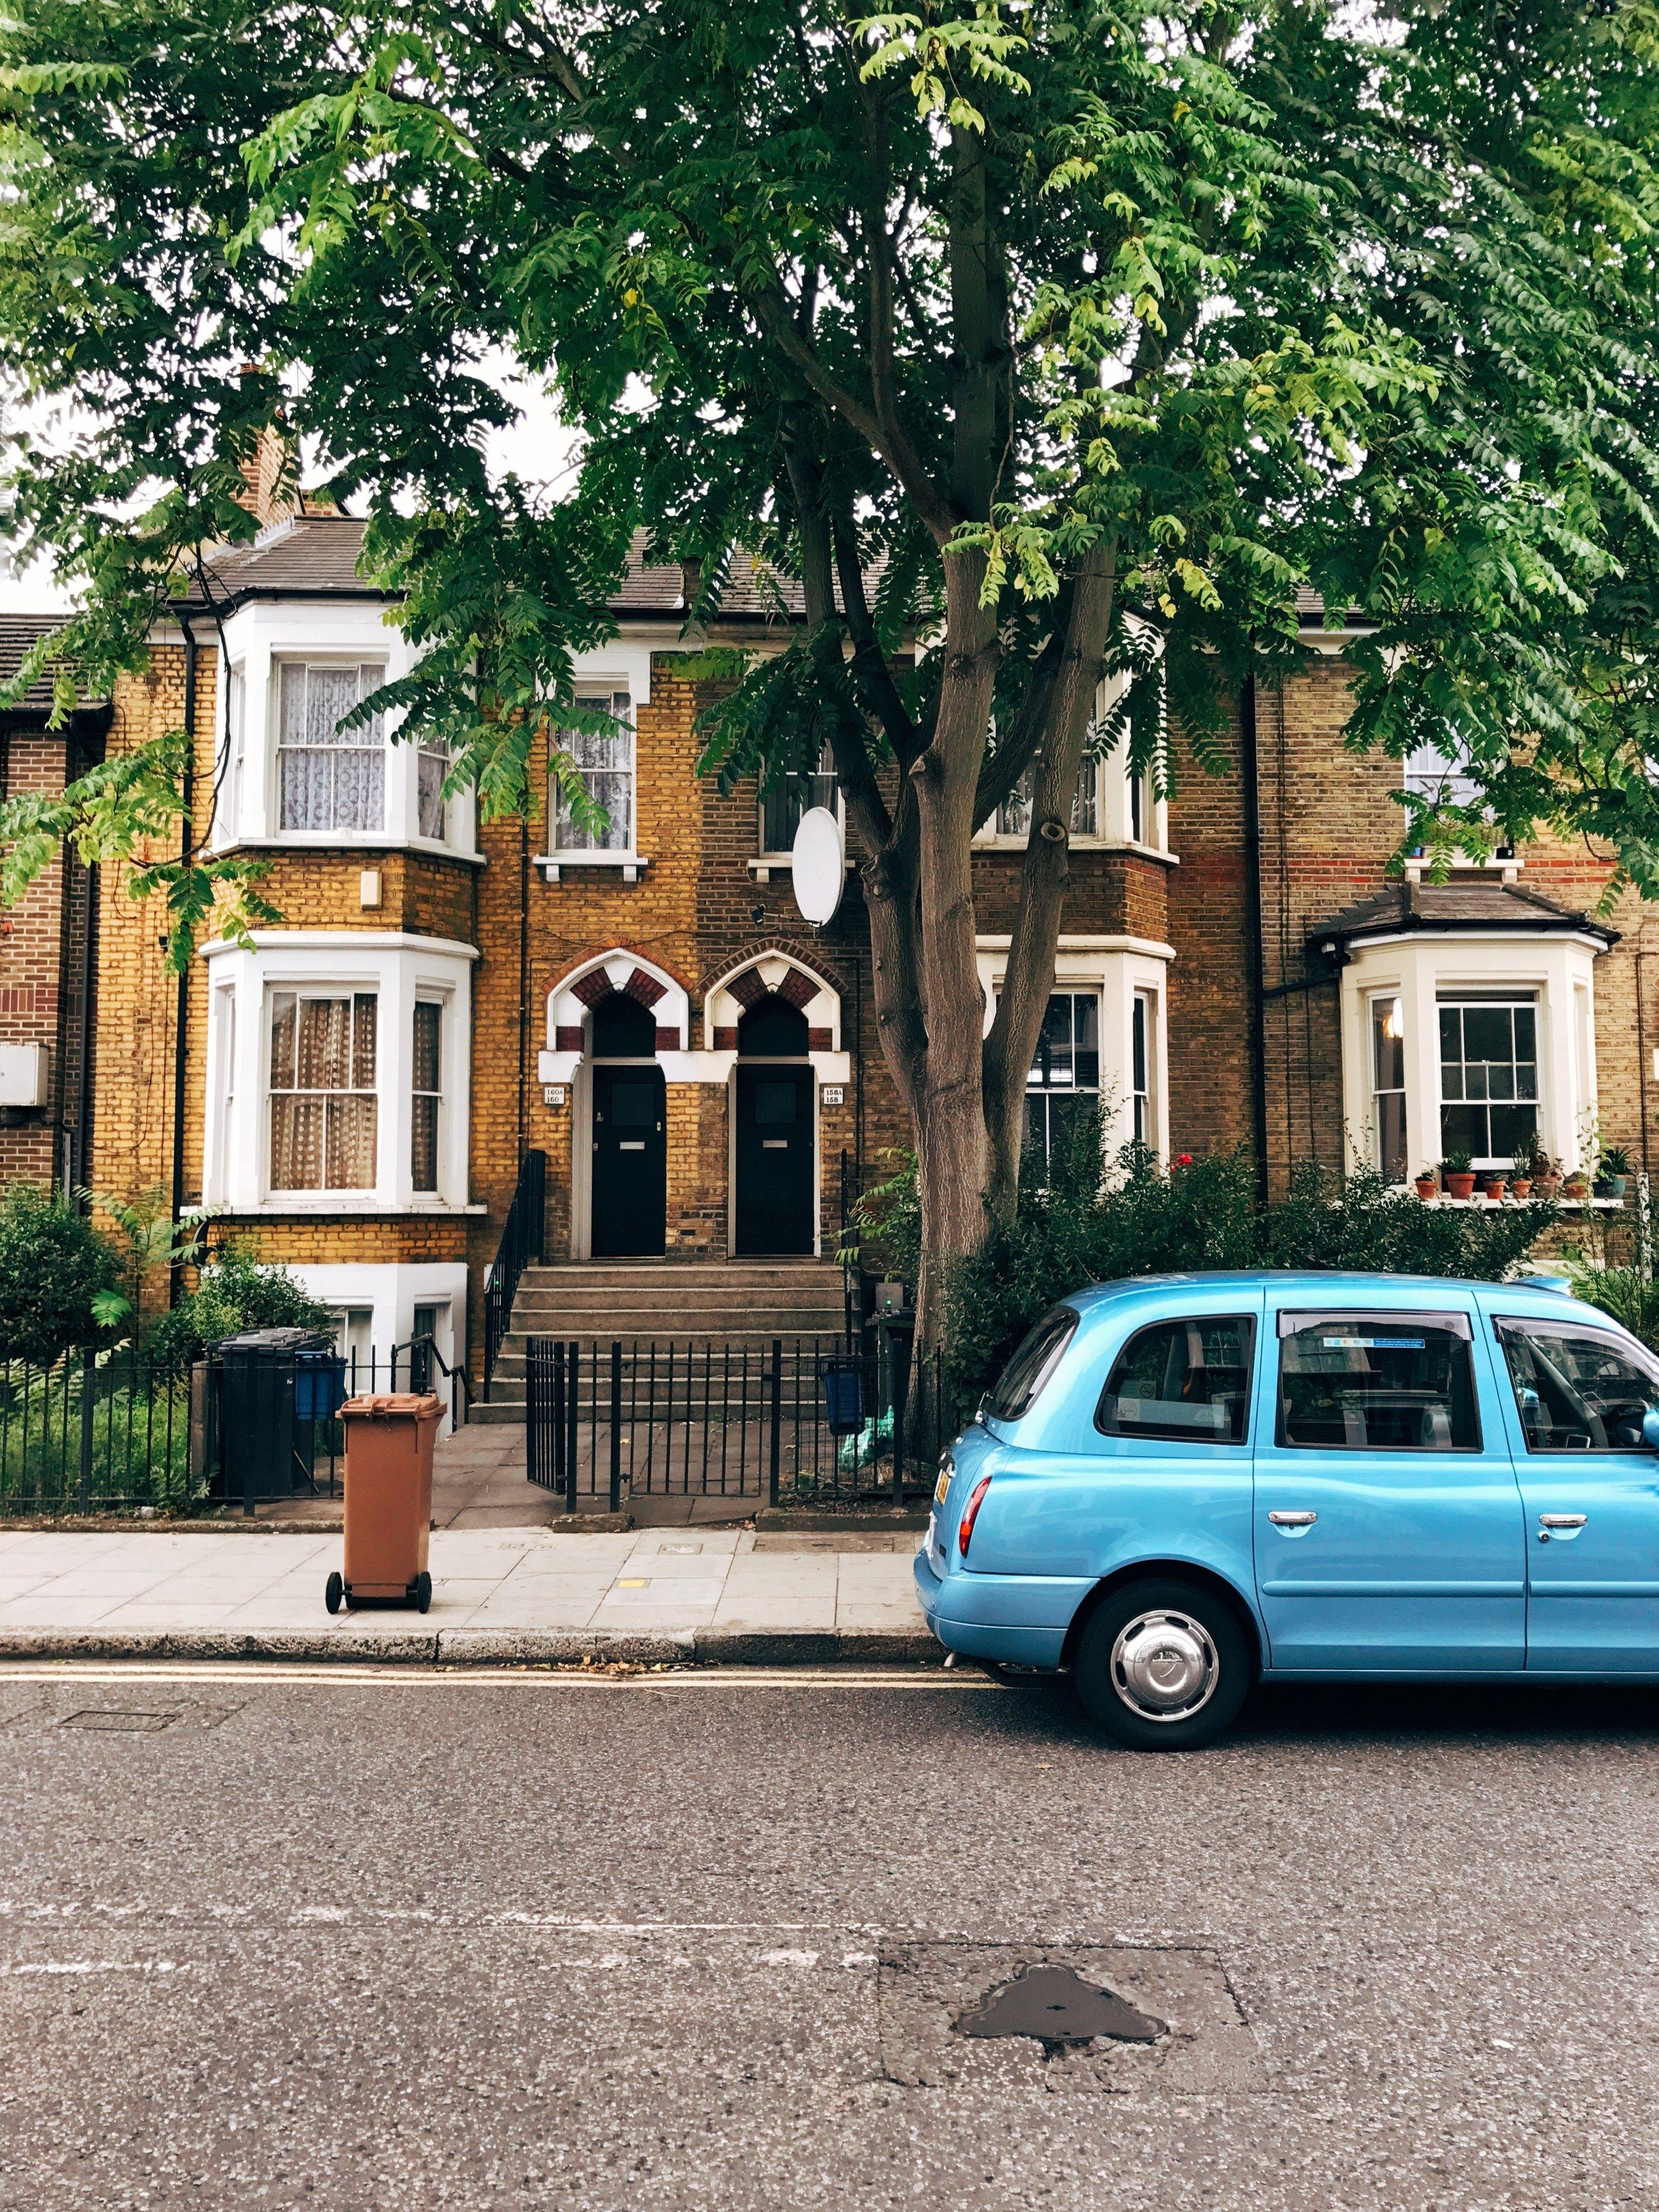 london-street-2.jpg